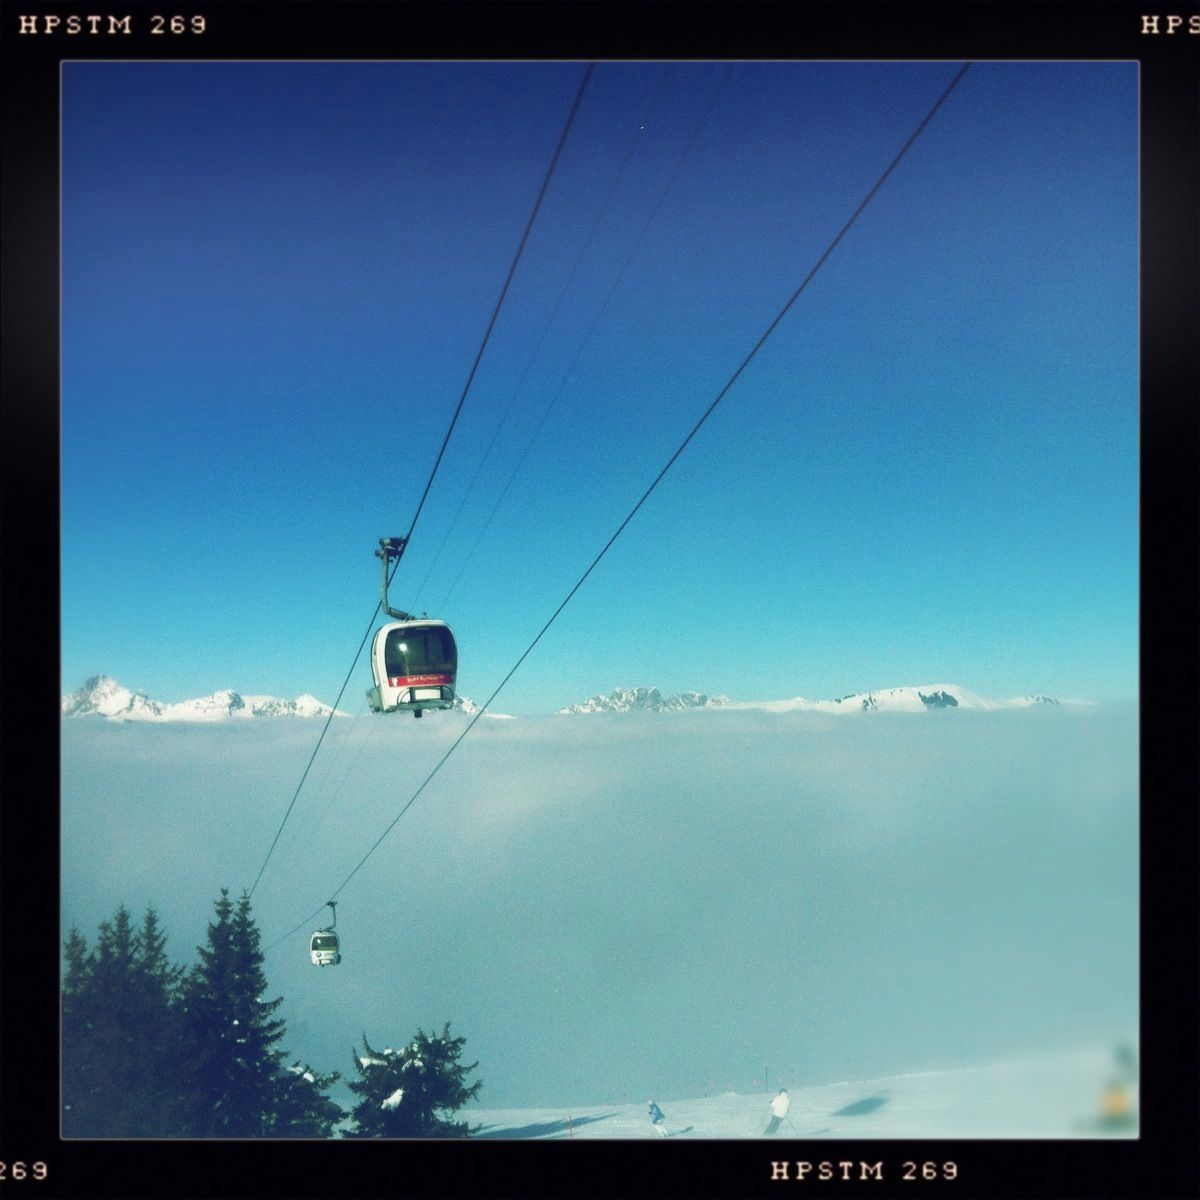 Wintersport in Gastaad05